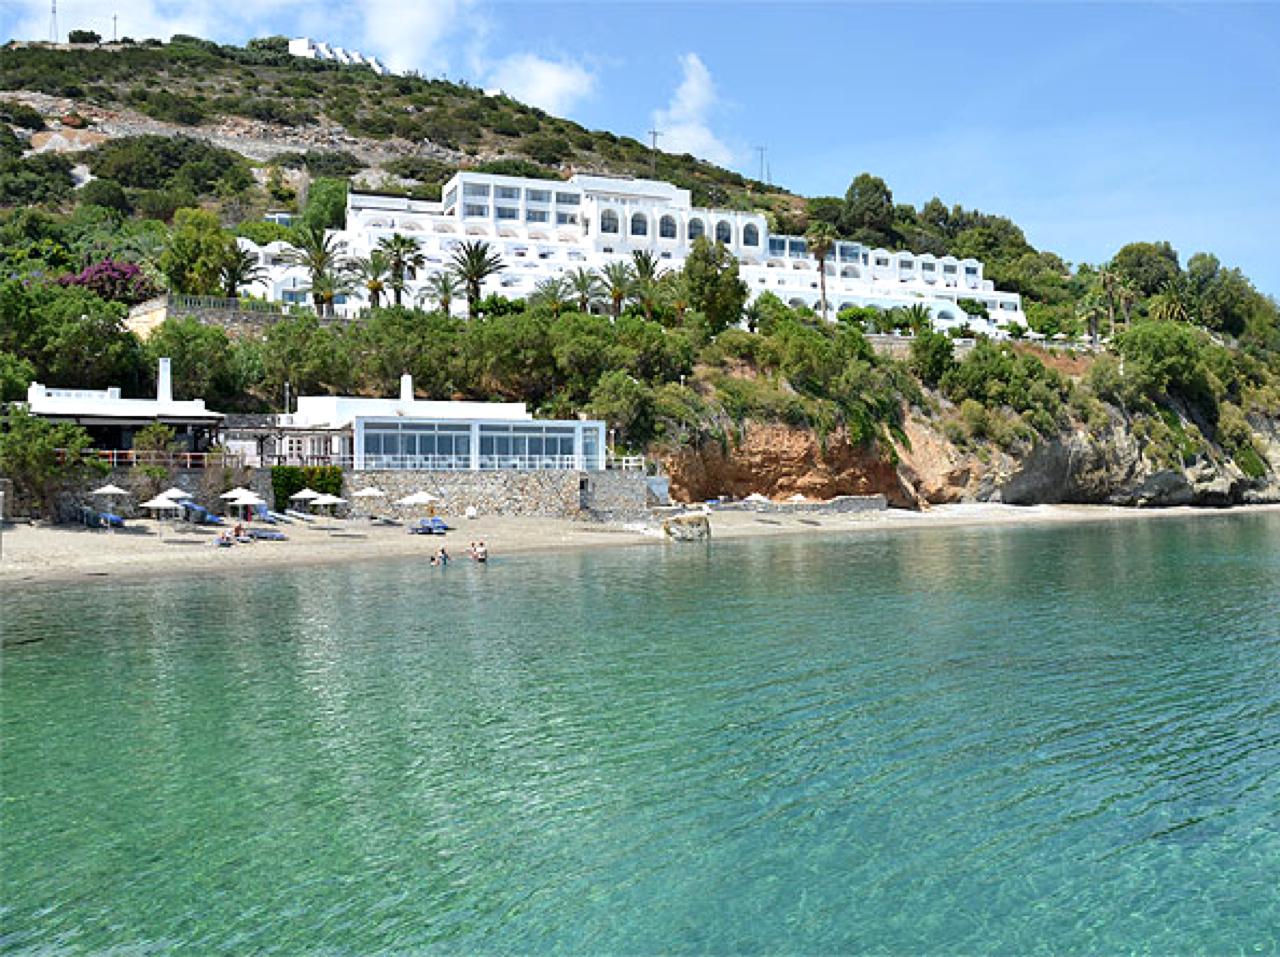 Photo of the Day : Istron Bay Hotel - Near Agios Nikolaos Crete